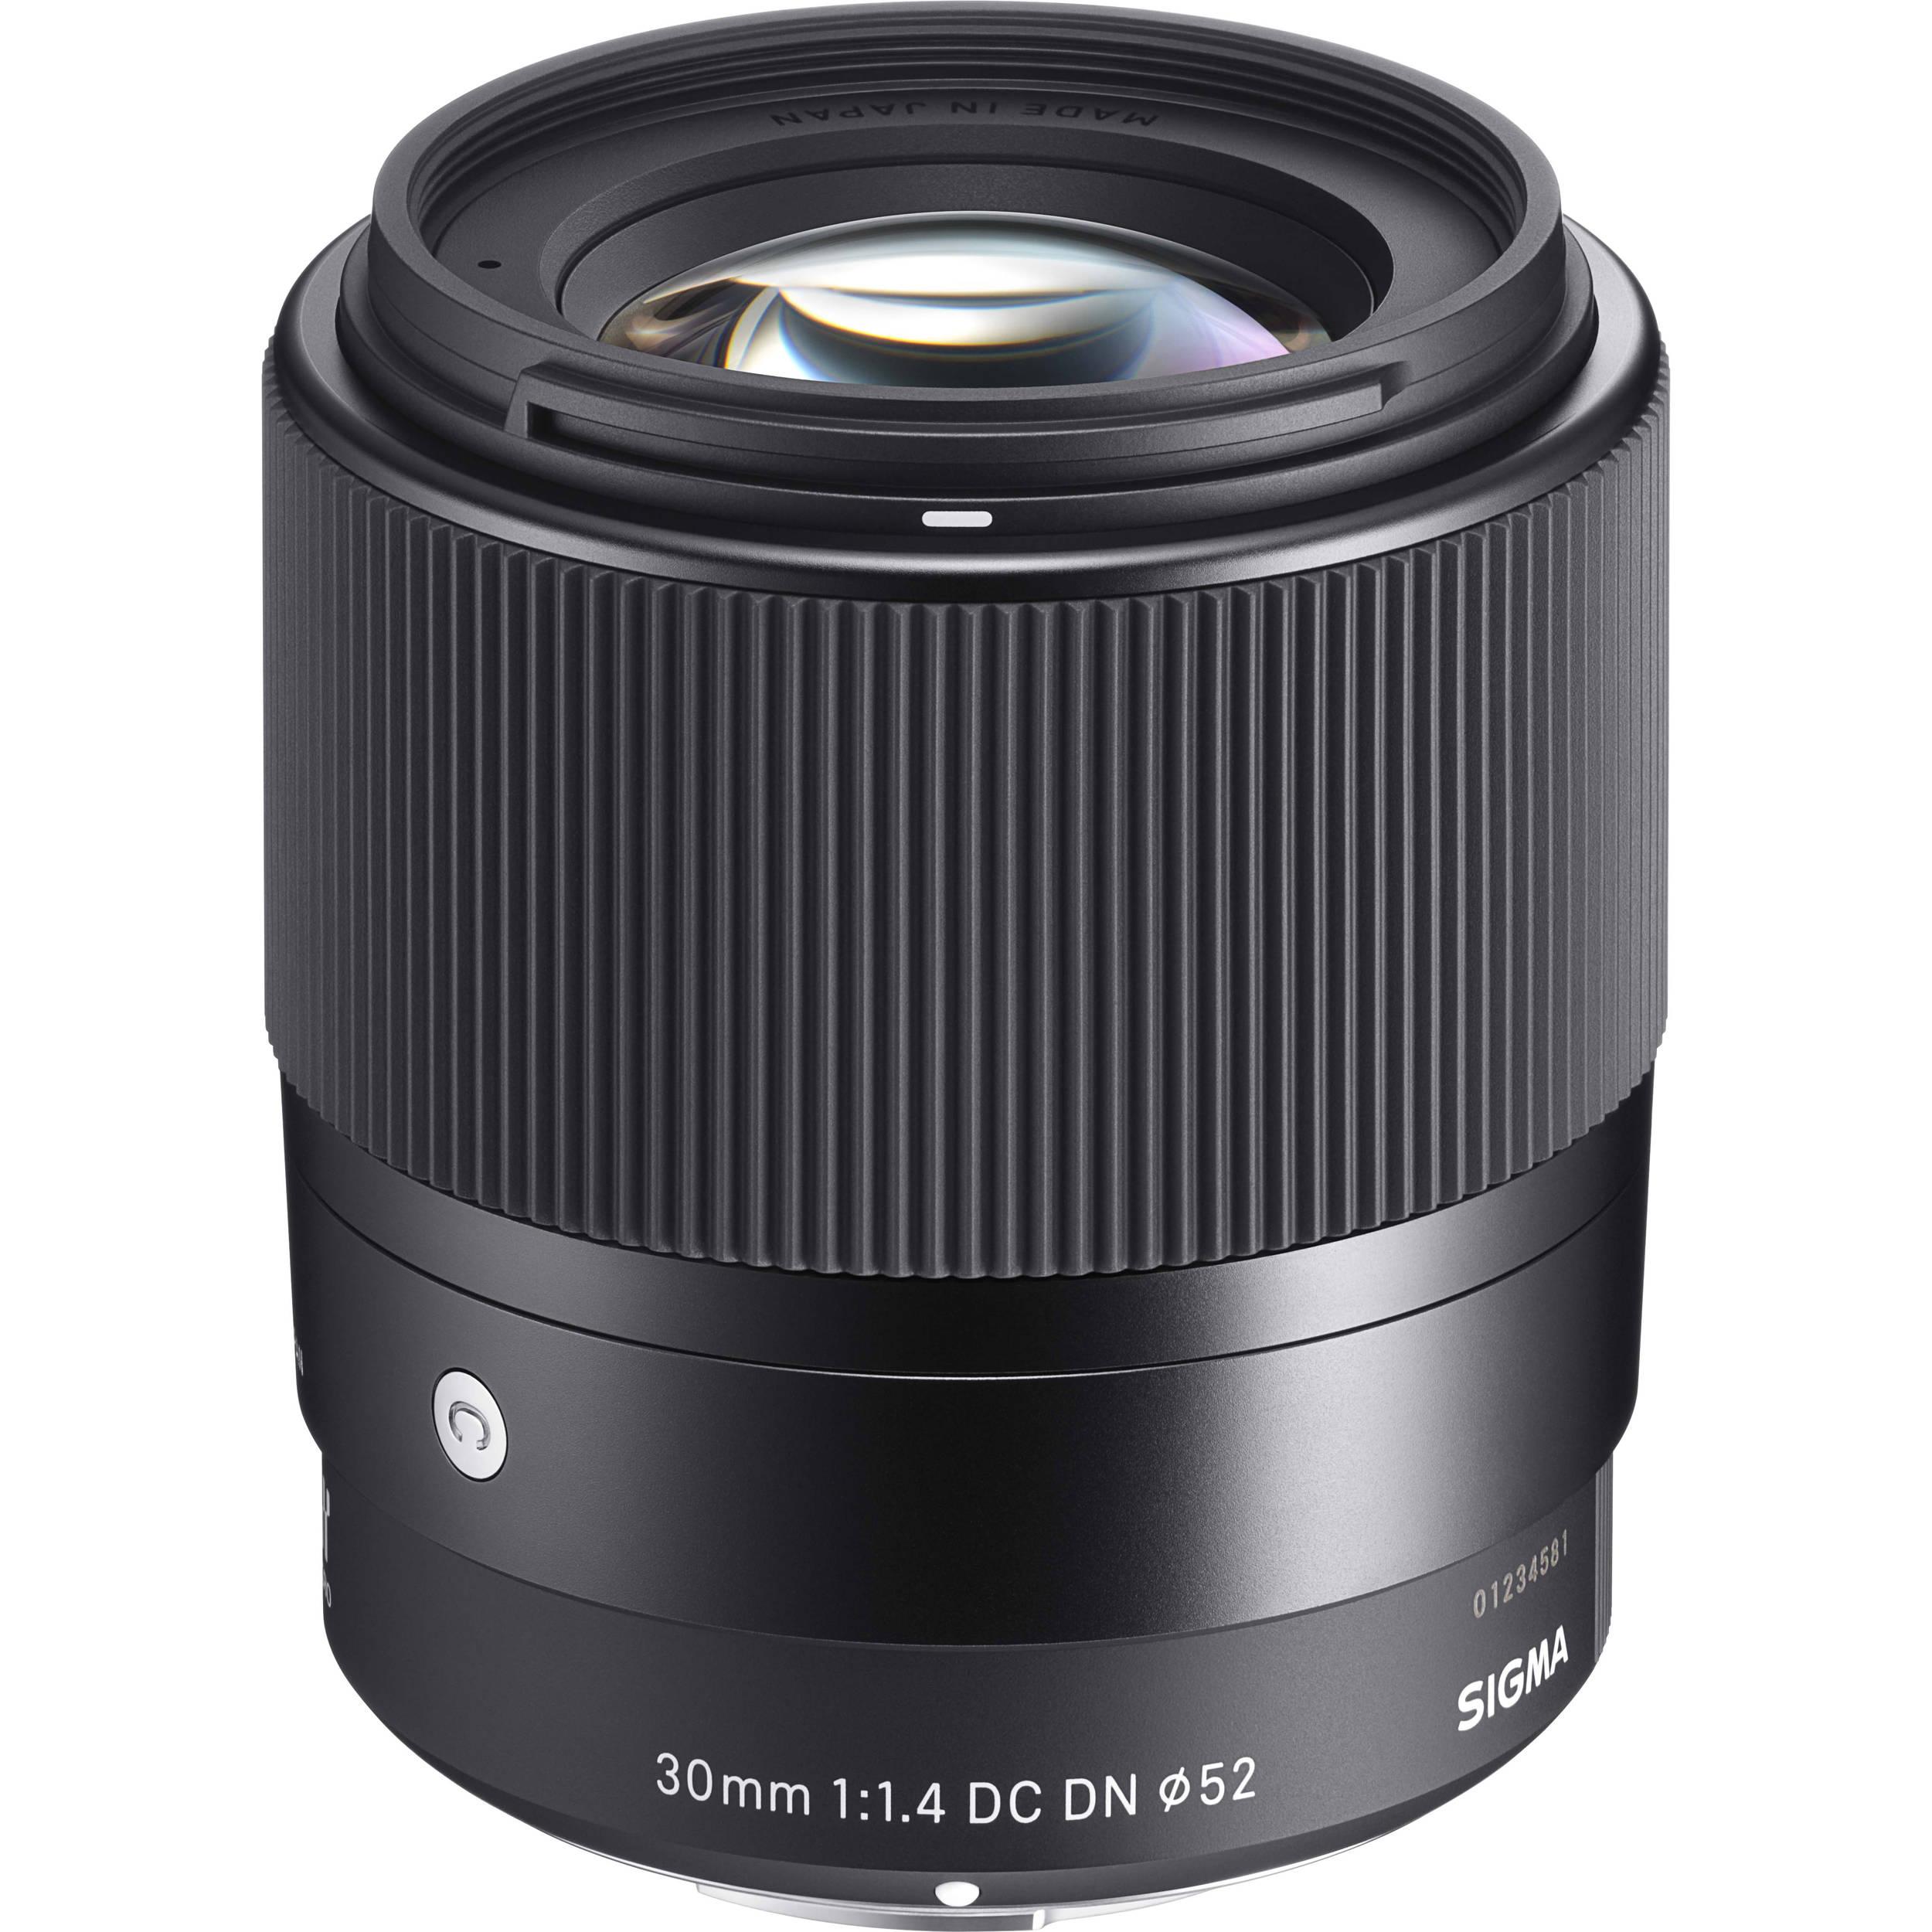 Sigma 30mm 1.4